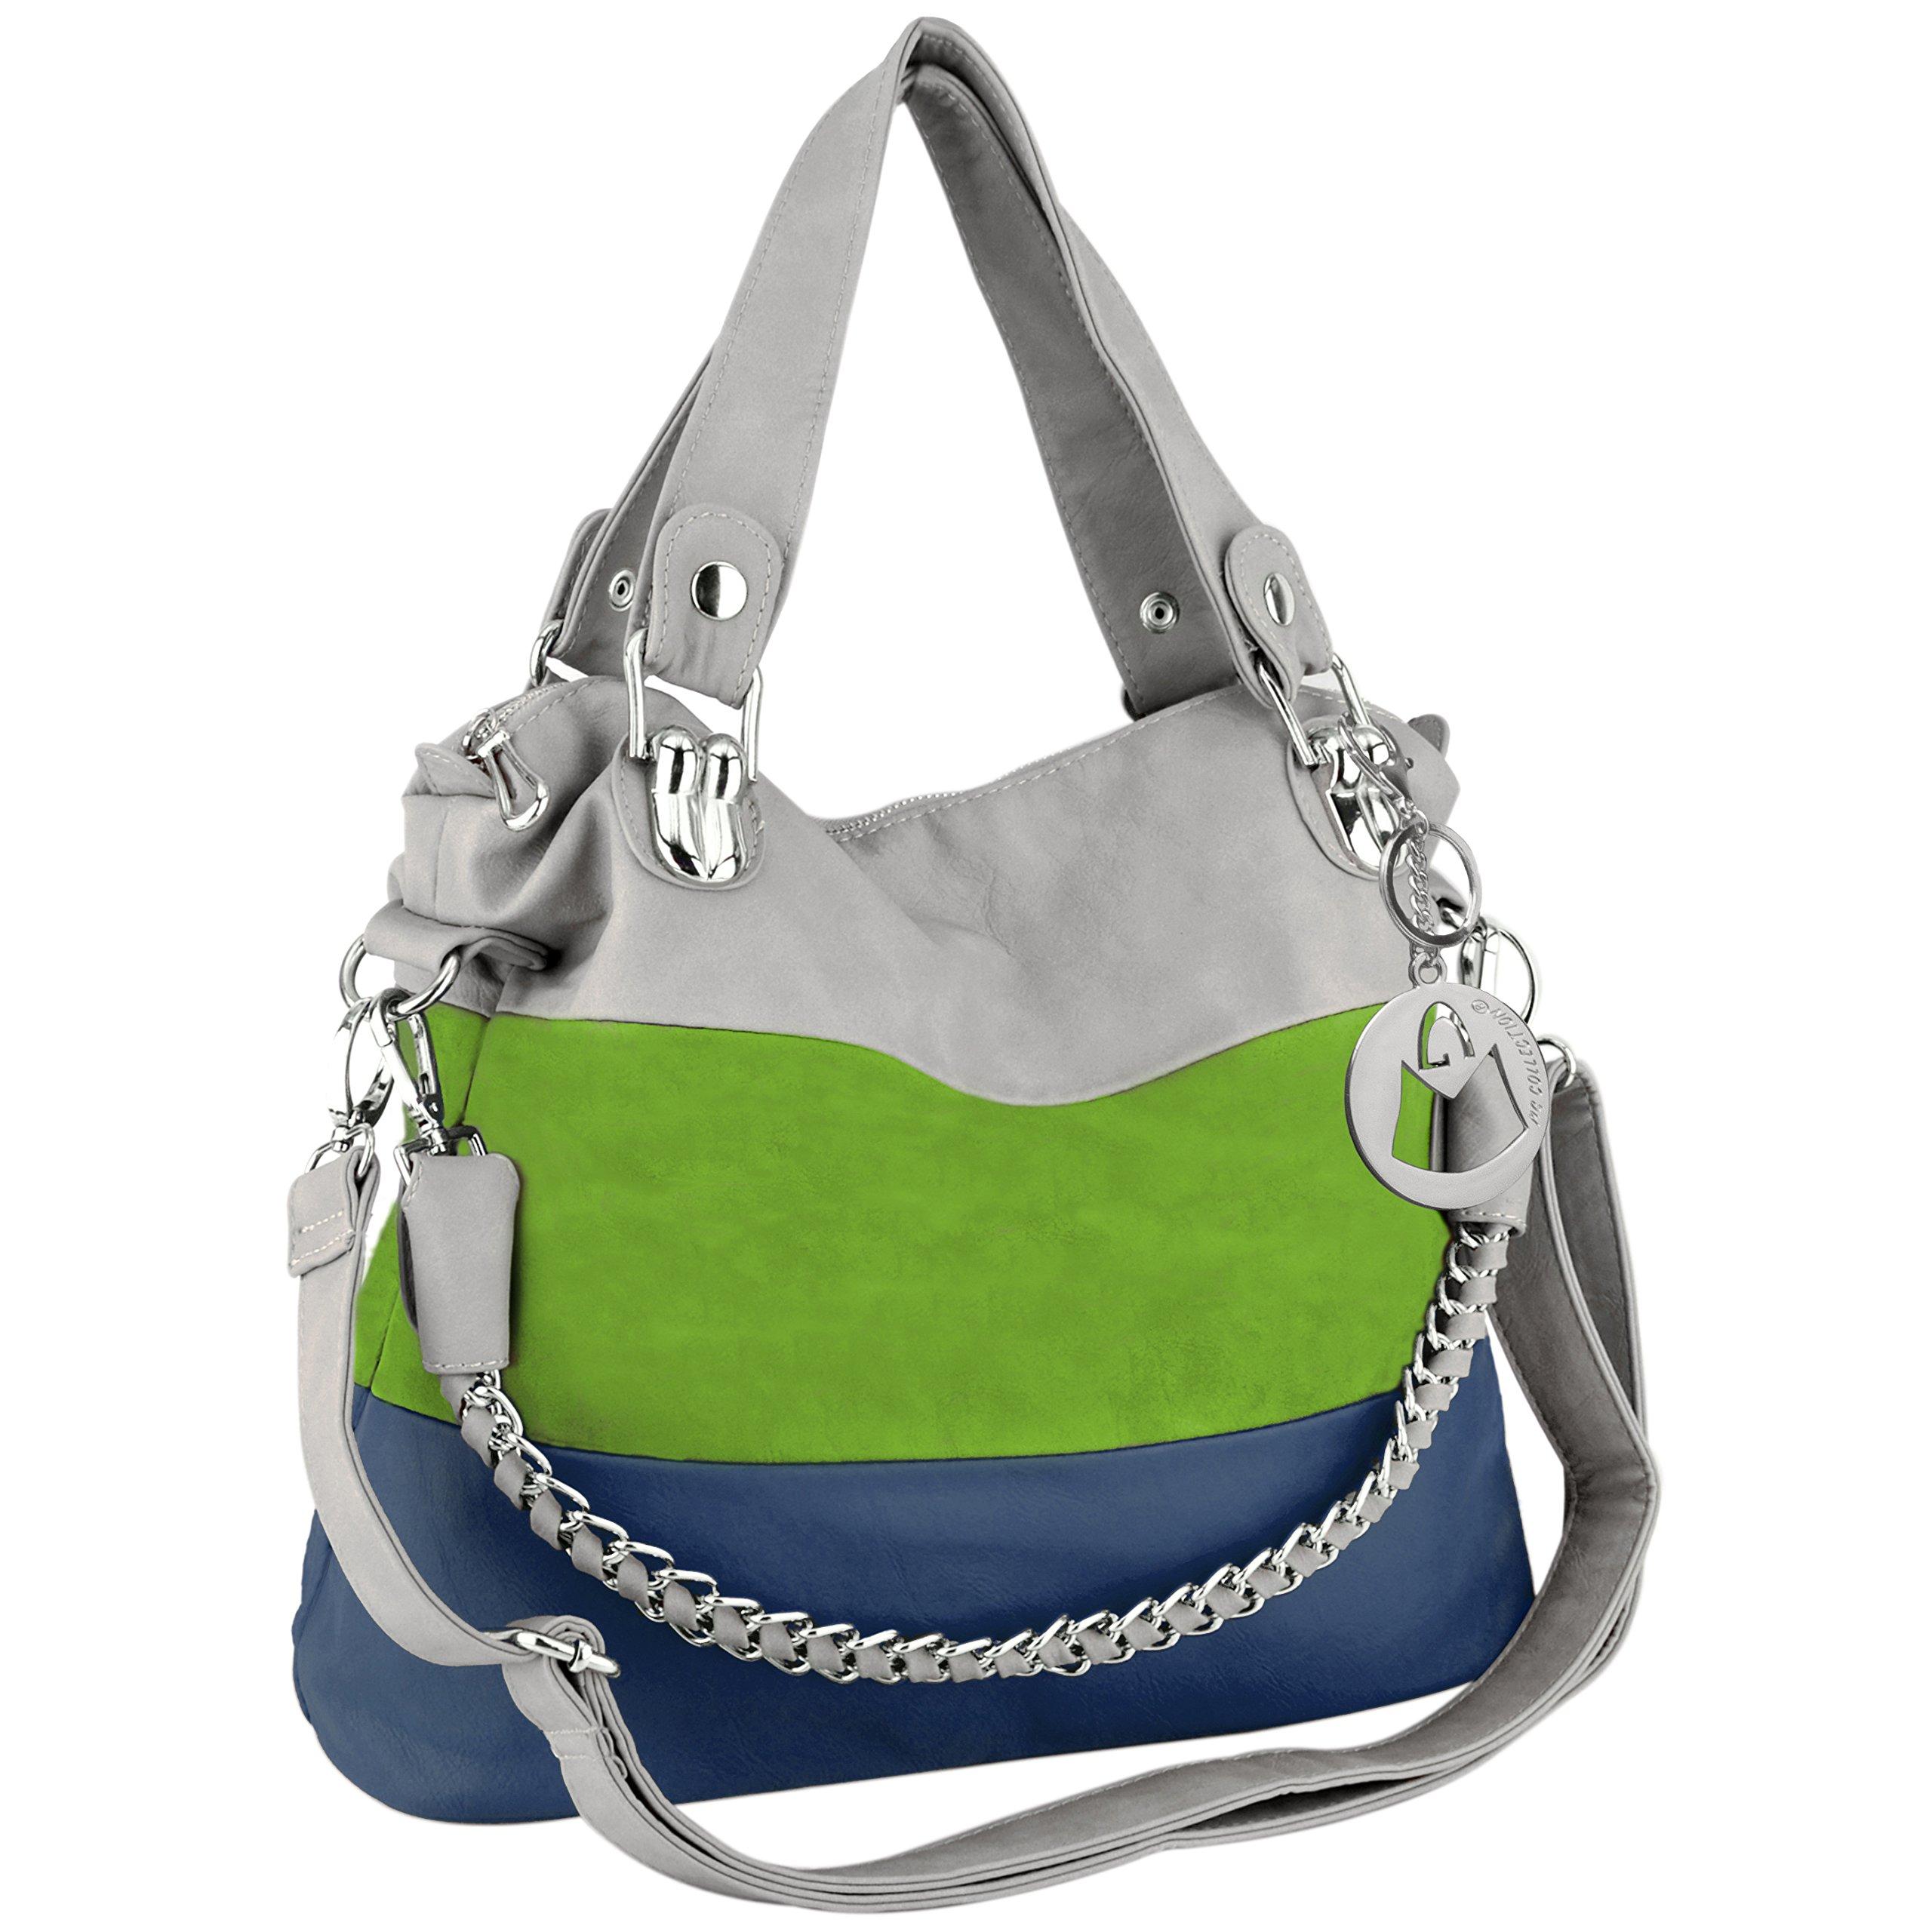 MG Collection MAWAR Green / Blue / Gray Chic Hobo Style Shoulder Handbag / Purse